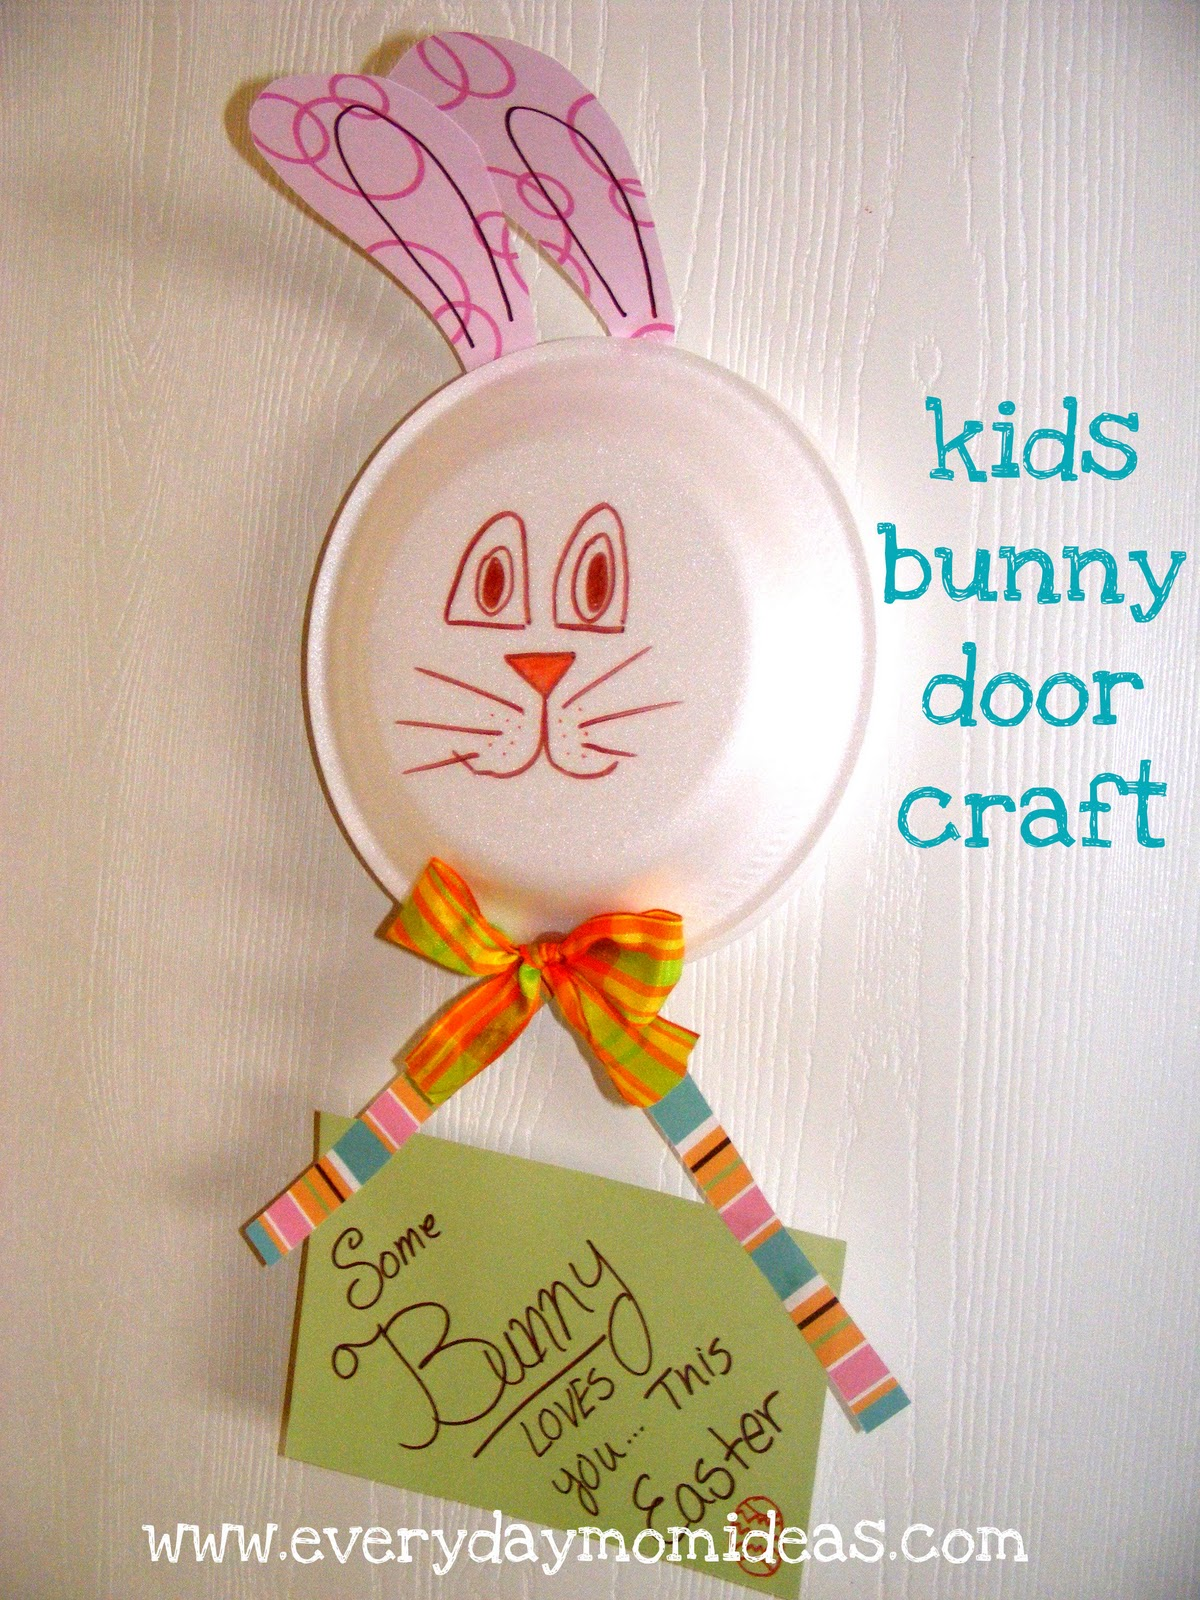 Easter Bunny Door Decor Craft Idea For Kids - Everyday Mom ...